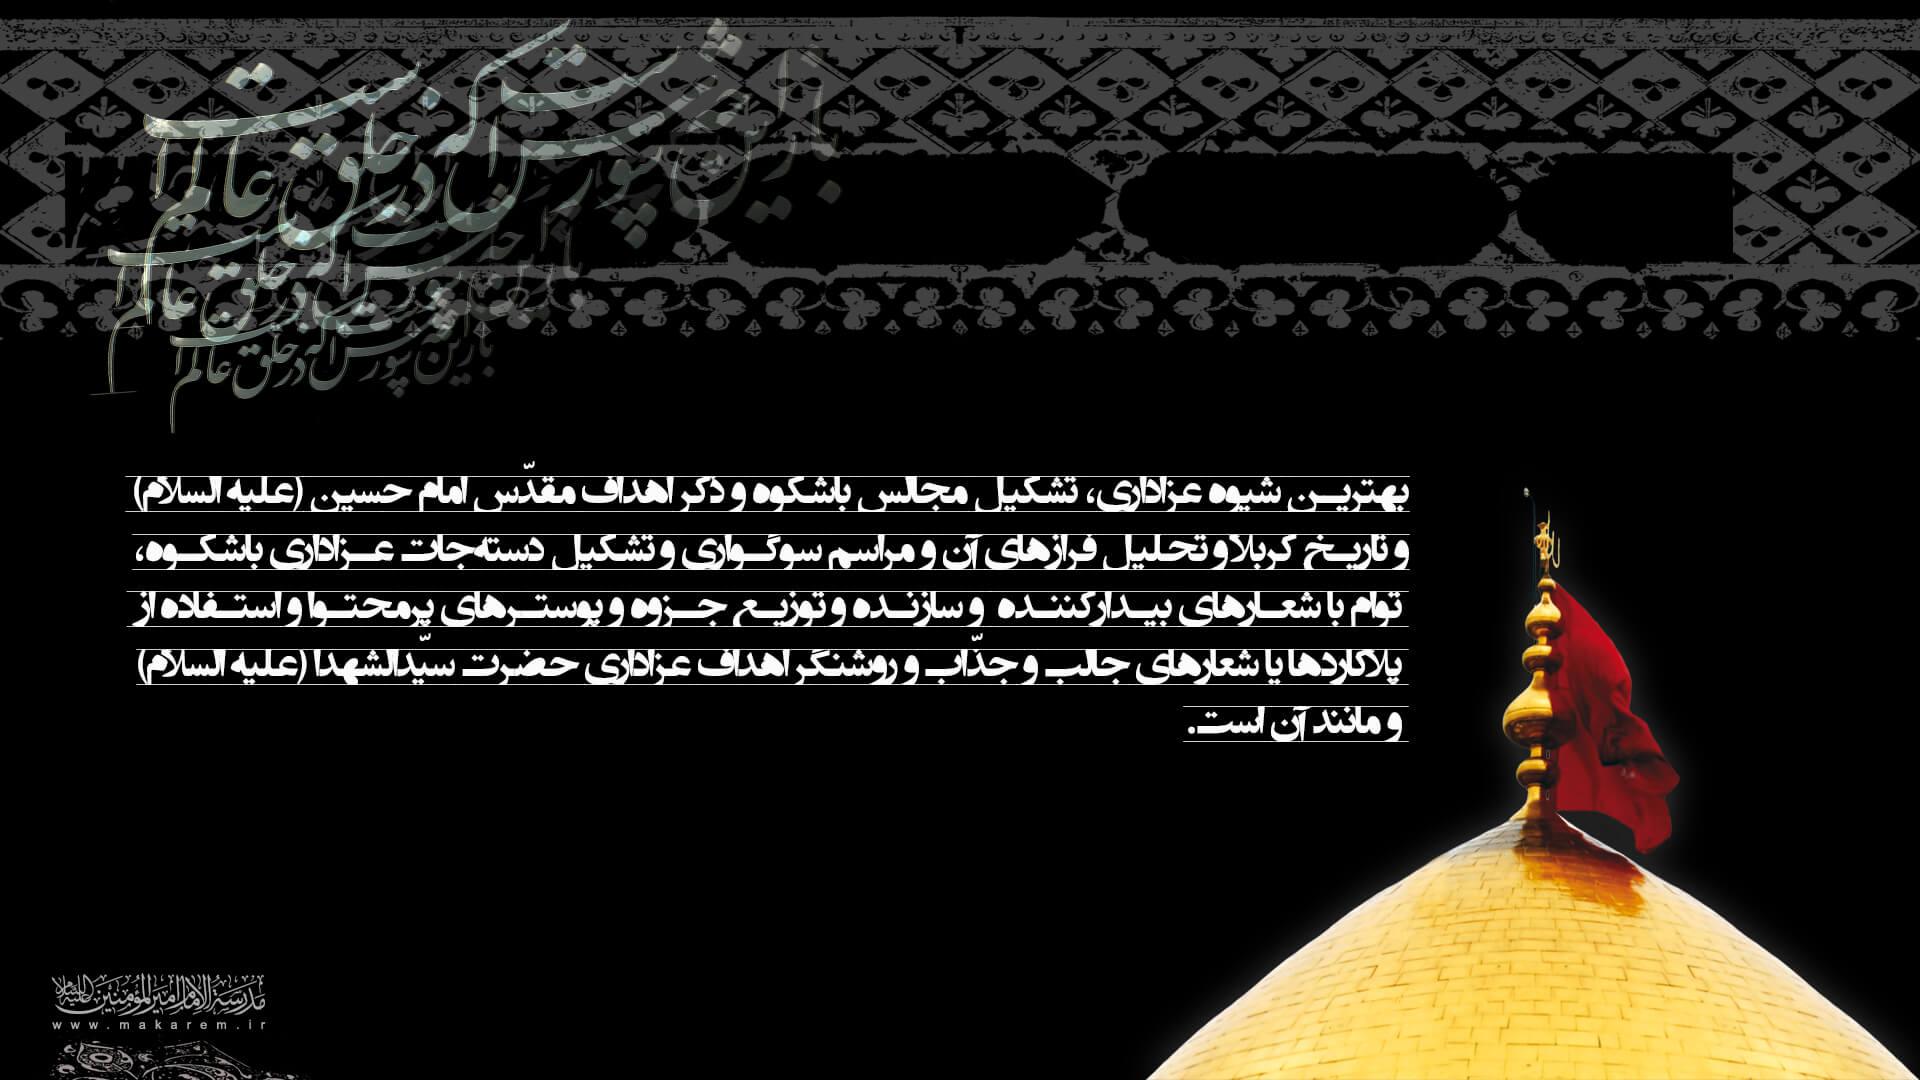 احکام عزاداری 06-مدرسه الامام امیر المومنین (ع)